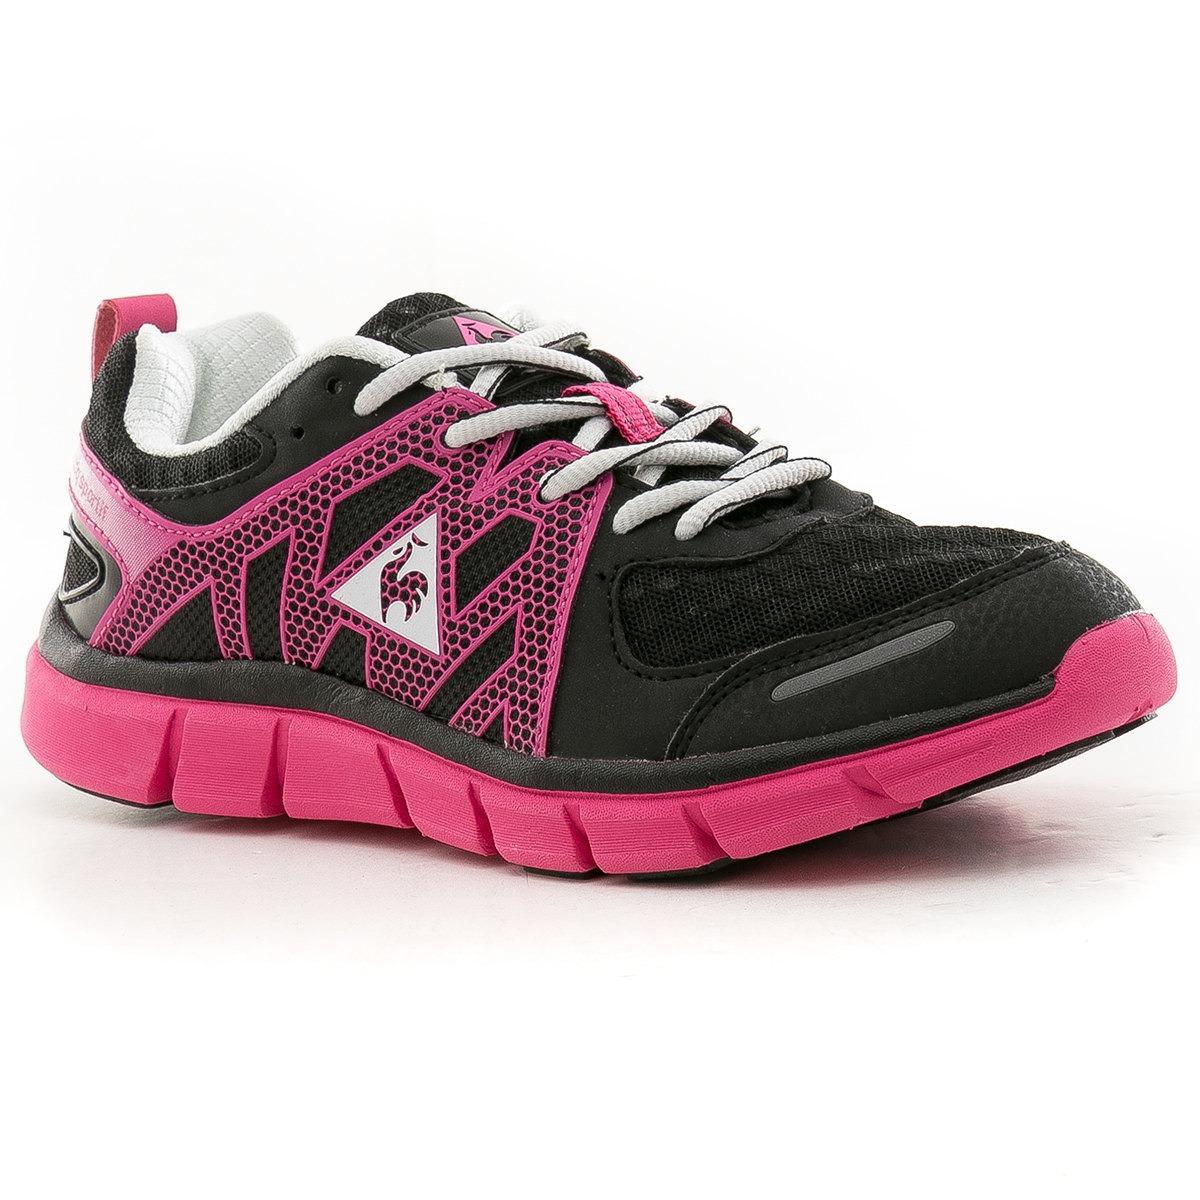 745d3be23ea ... authentic zapatillas acer lady negro rosa le coq sportif. cargando zoom.  b61bb cf4e6